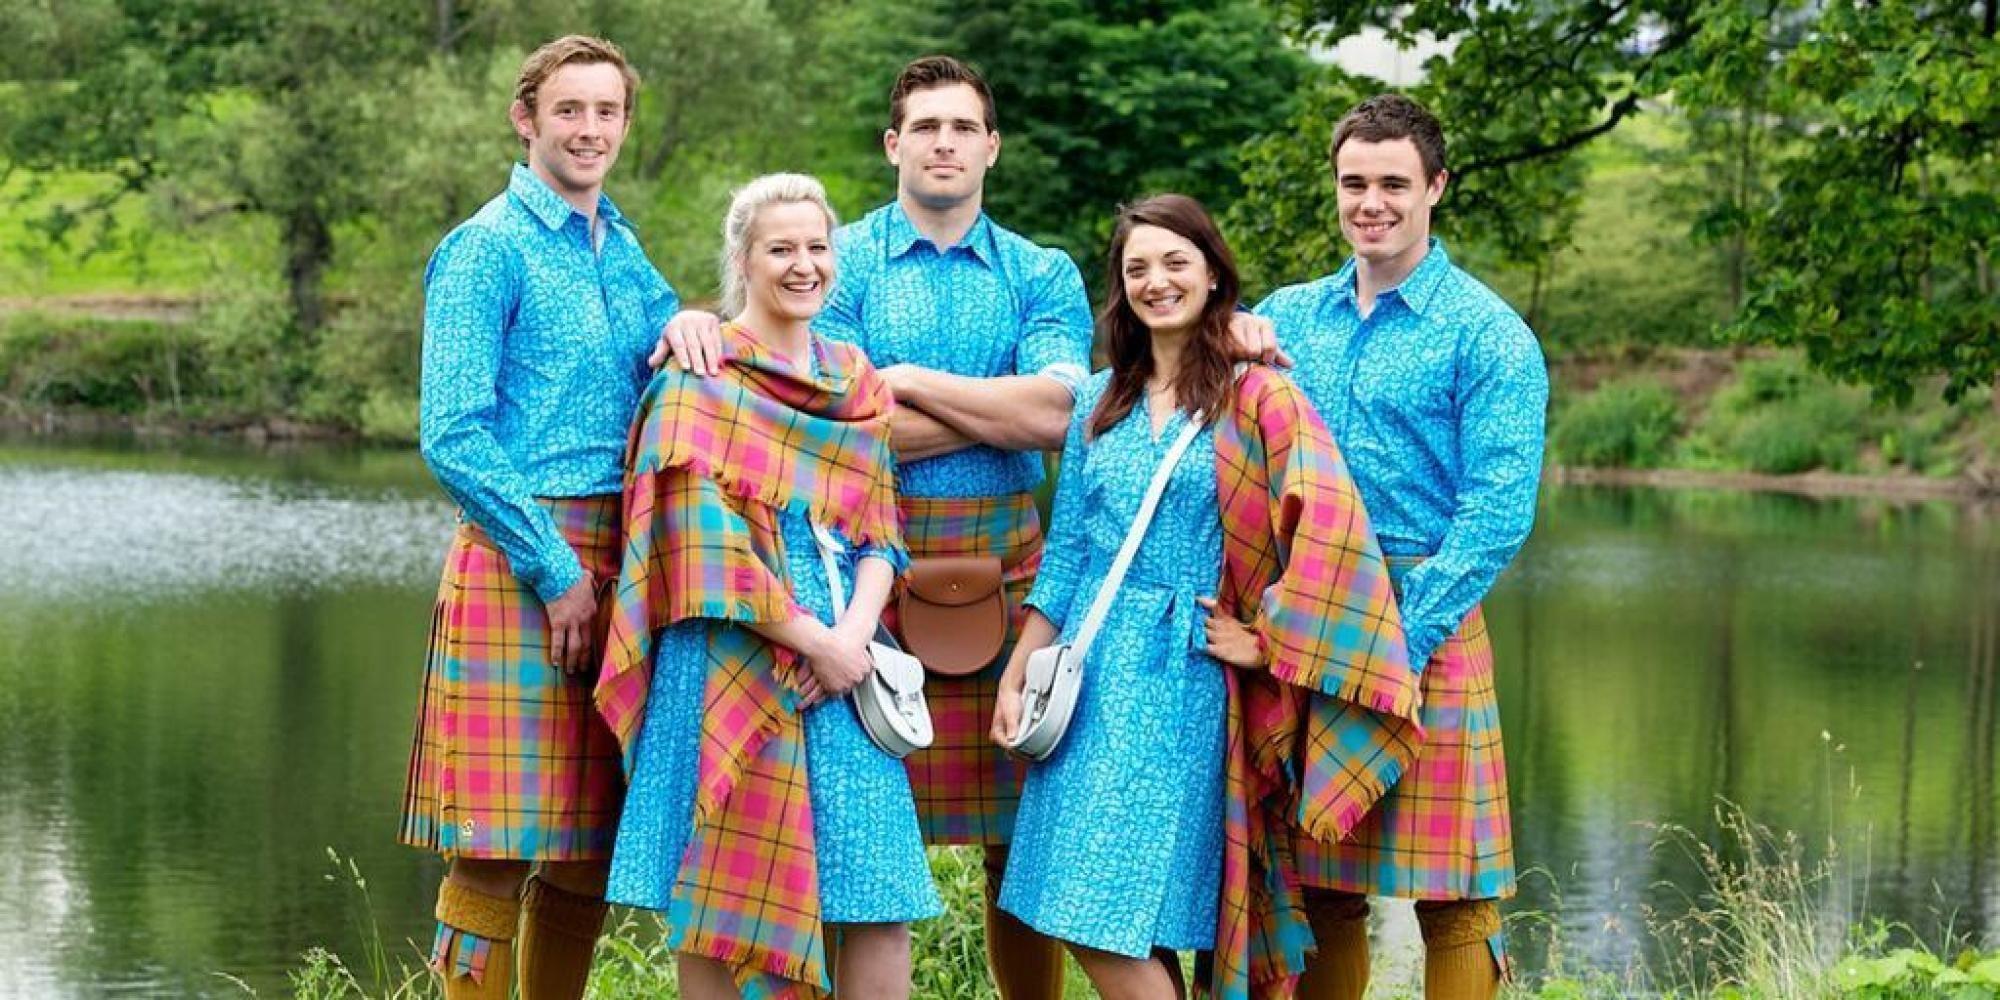 o-scotland-commonwealth-games-kit-facebook.jpg (2000×1000)